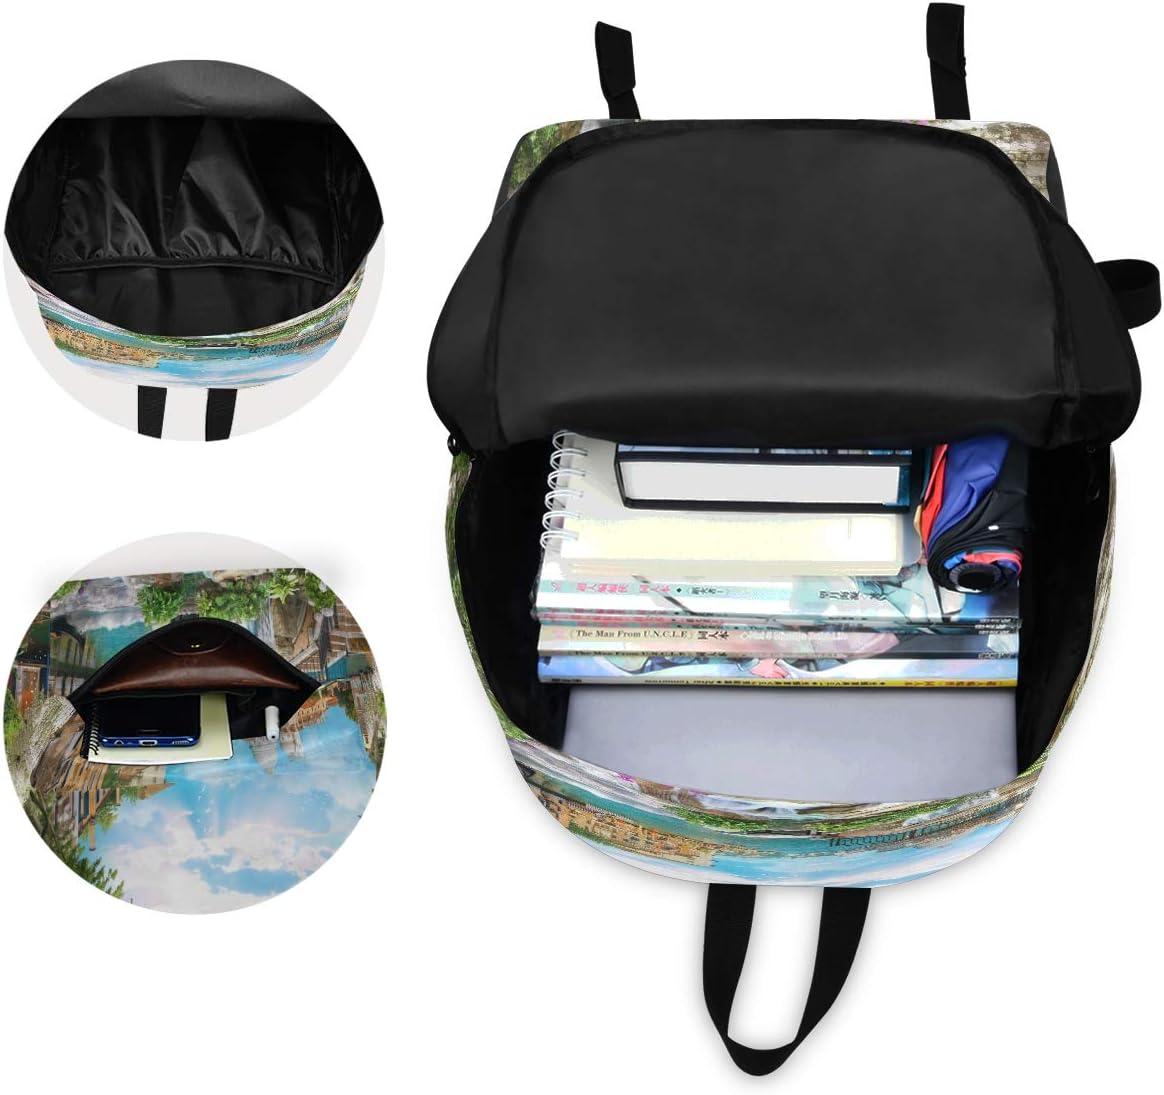 Beauty Collage Bridge Lake Laptop Backpack Bookbag House Stone Ladder Travel Backpacks Casual Daypack Workbag Shoulders Bag Sports Bags for Women Men Working Hiking Outdoor